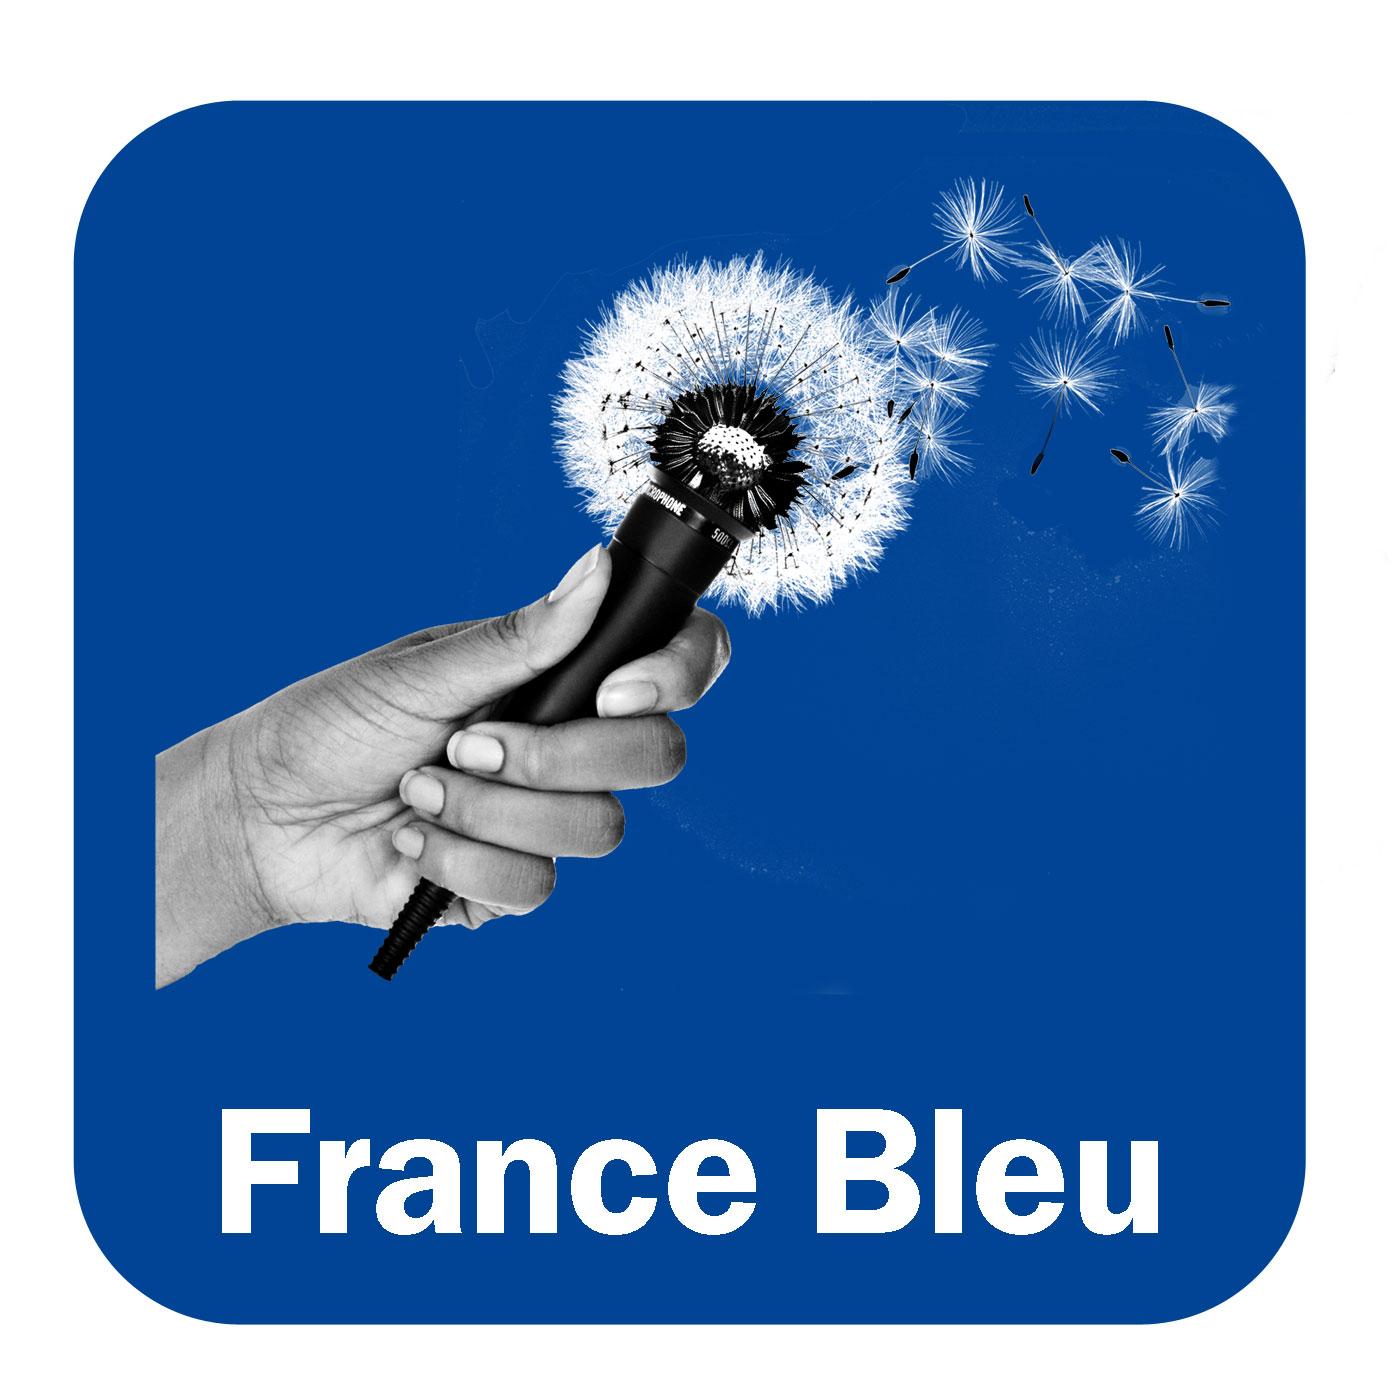 Planète Bleu Azur France Bleu Azur